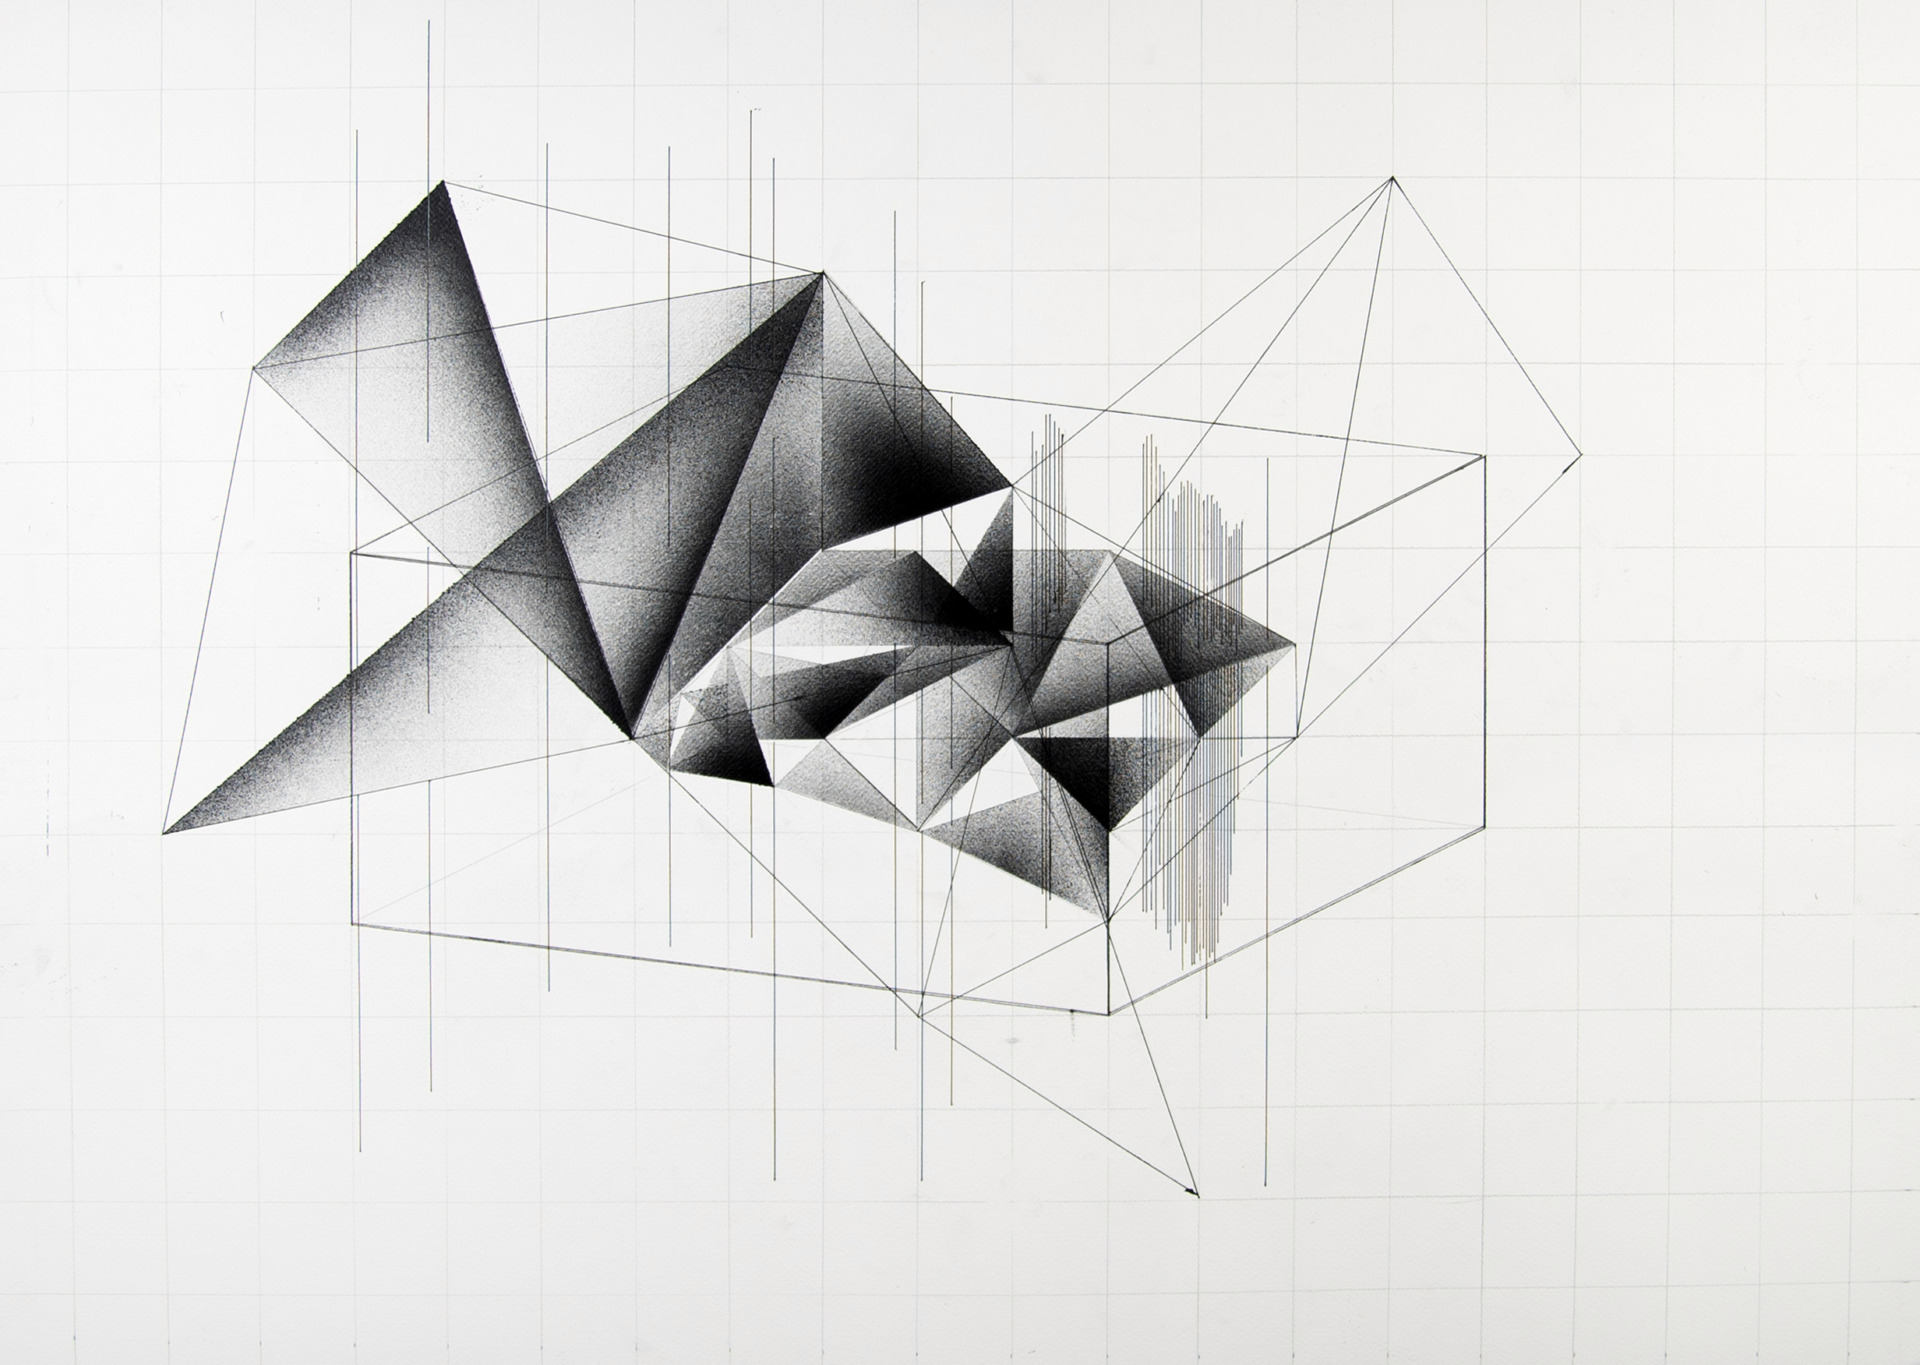 Contemporary art from Gyula Sági | Op. 051220. 7